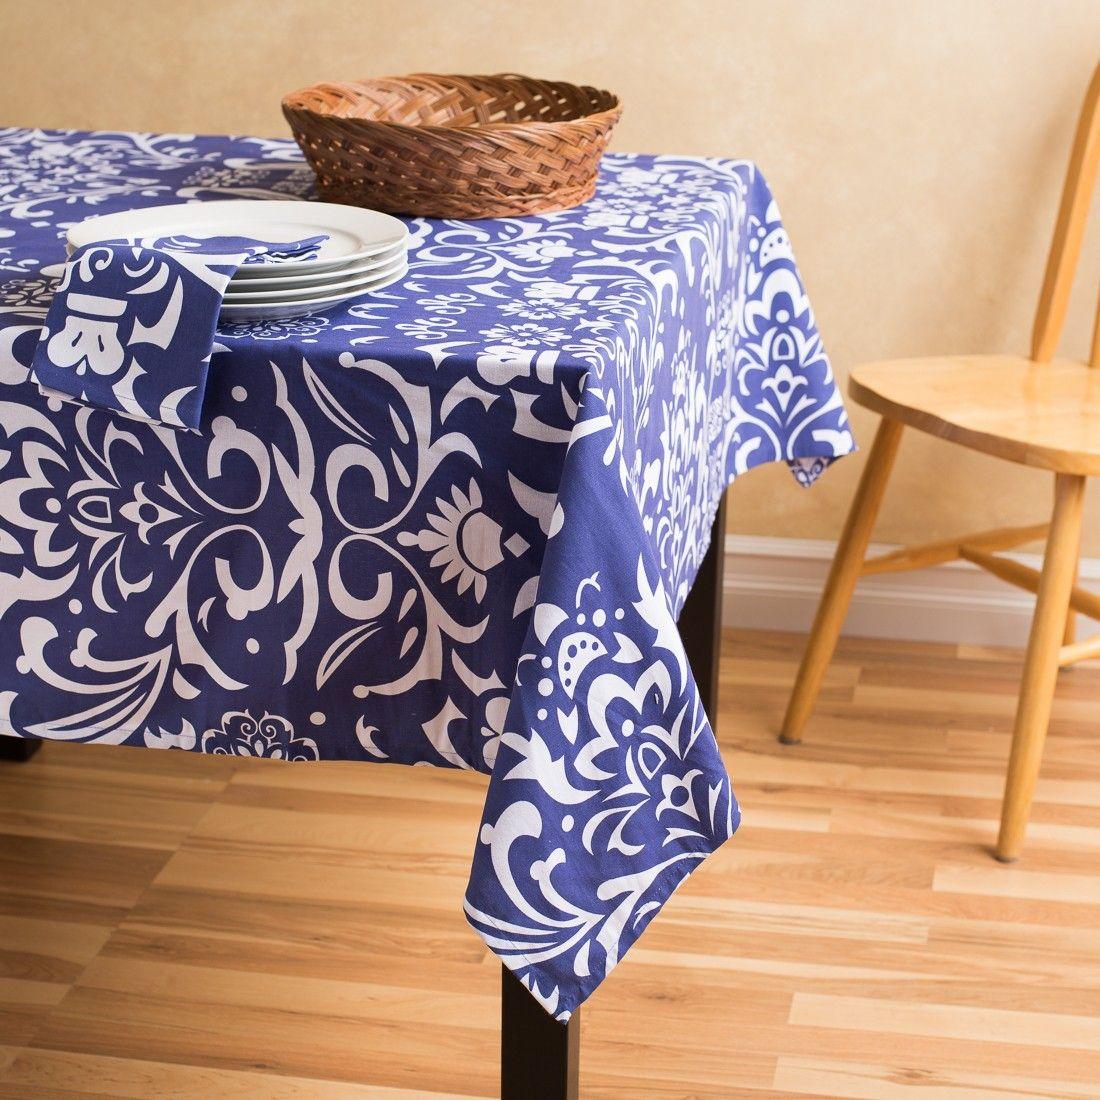 Navy Blue White Rectangular Cotton Vintage Royalty Tablecloth